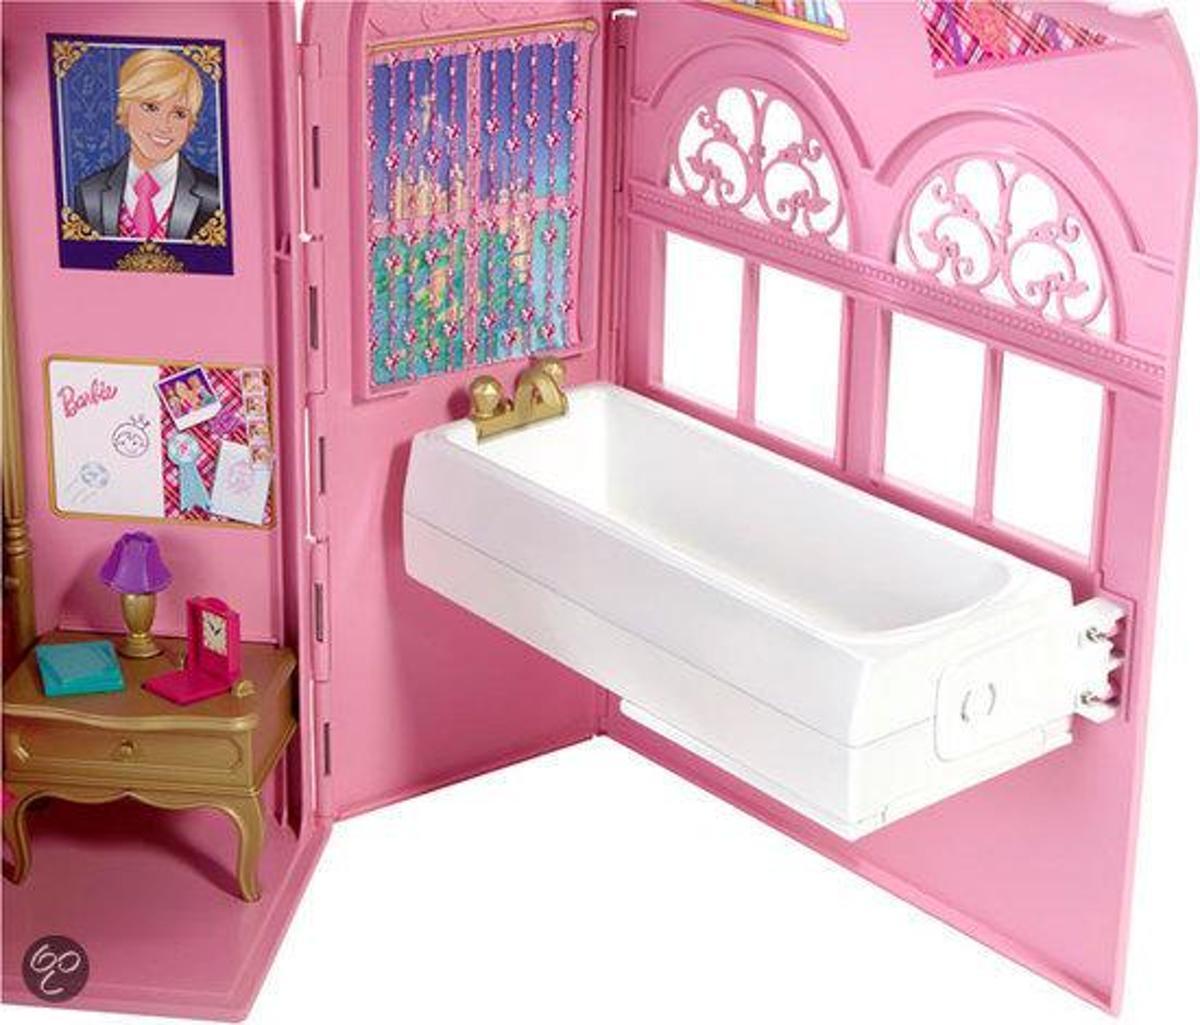 bol.com | Barbie Prinses Slaapkamer Speelset, Mattel | Speelgoed